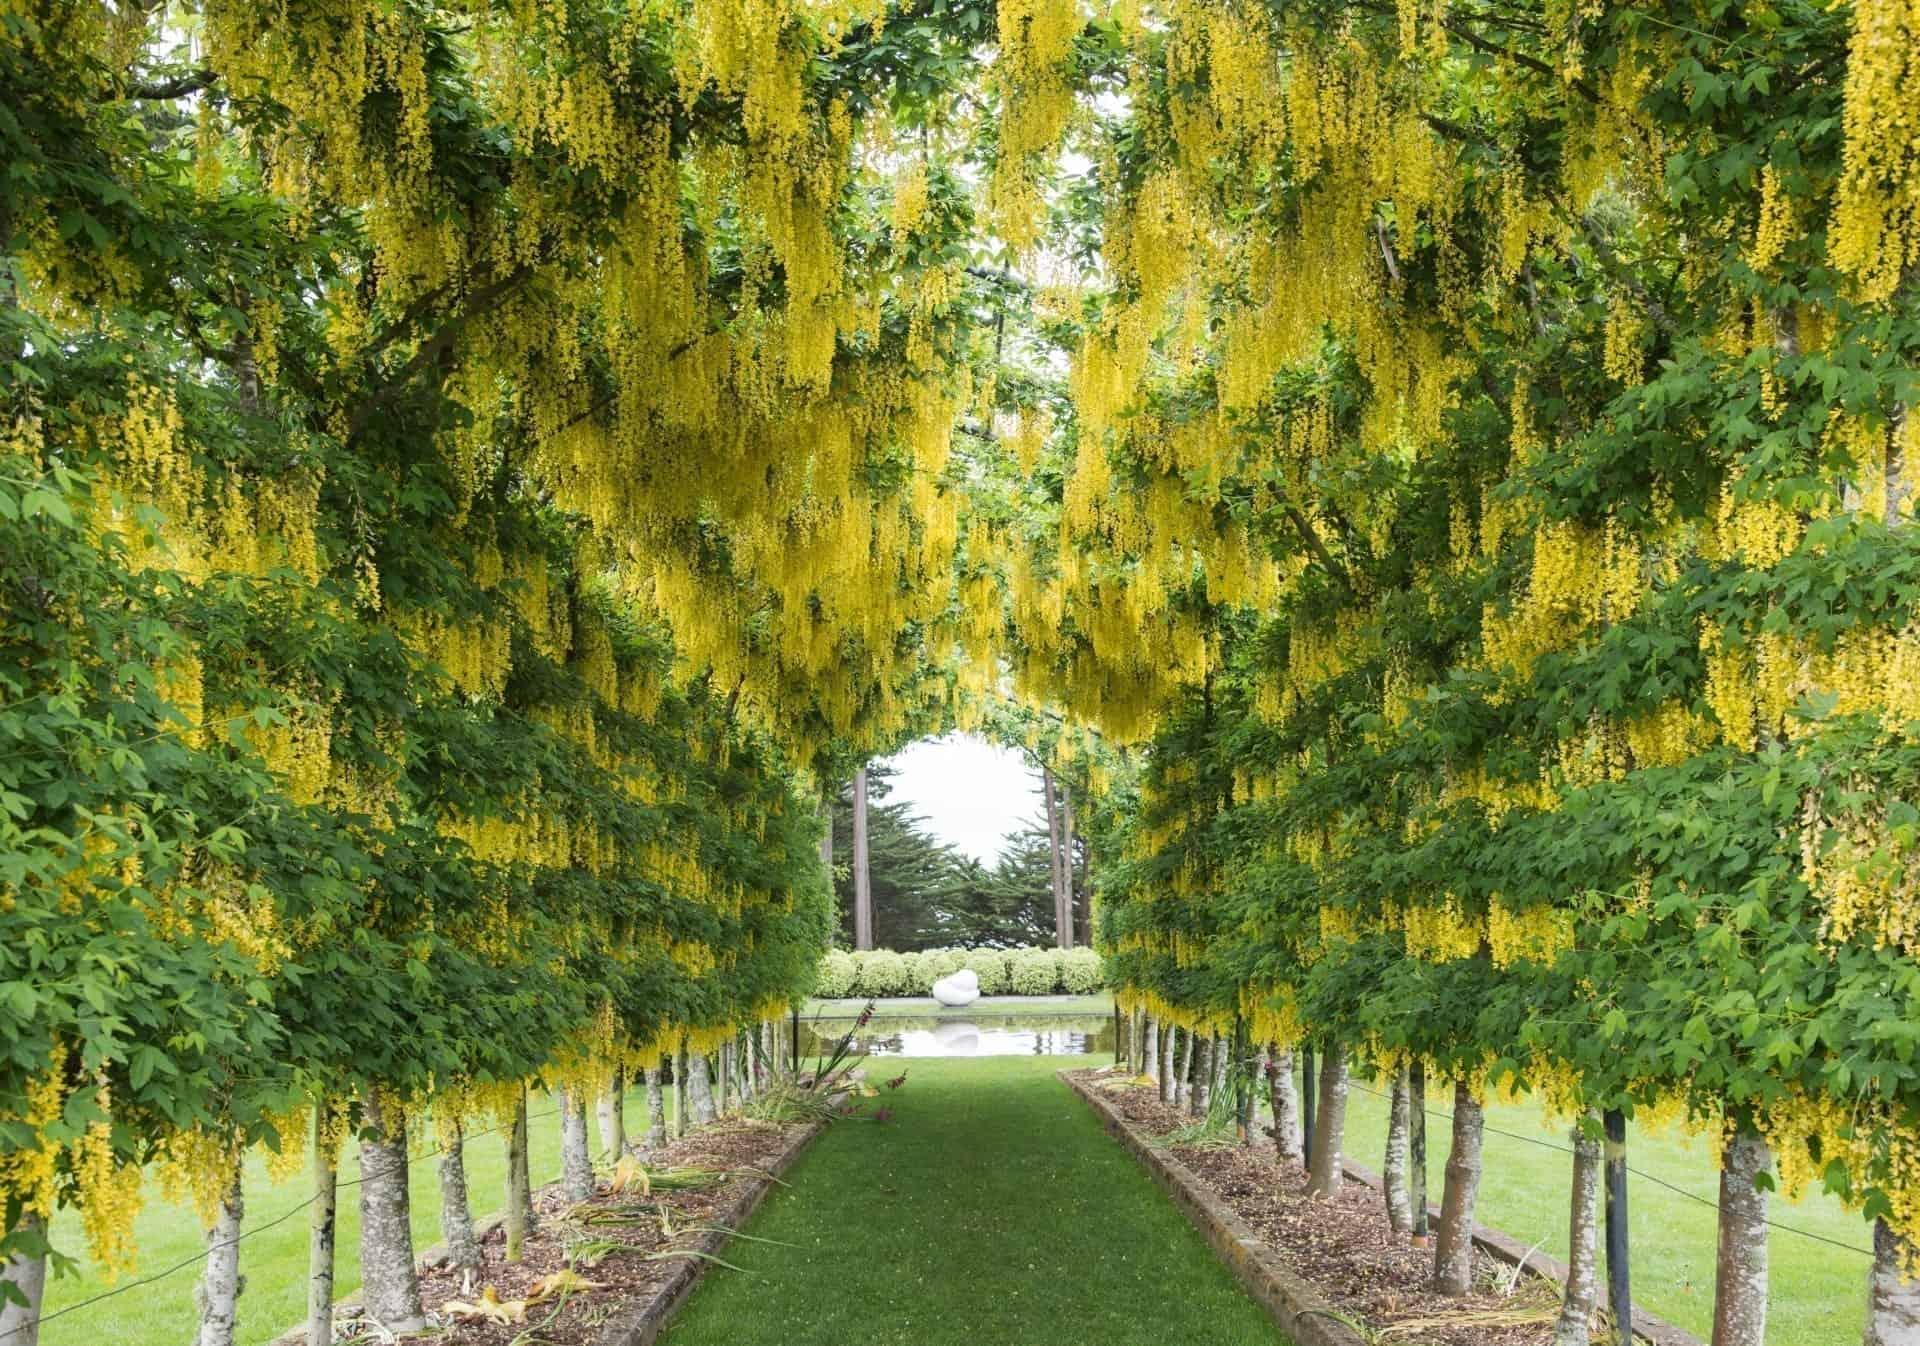 Laburnum Arch, Bodnant Gardens